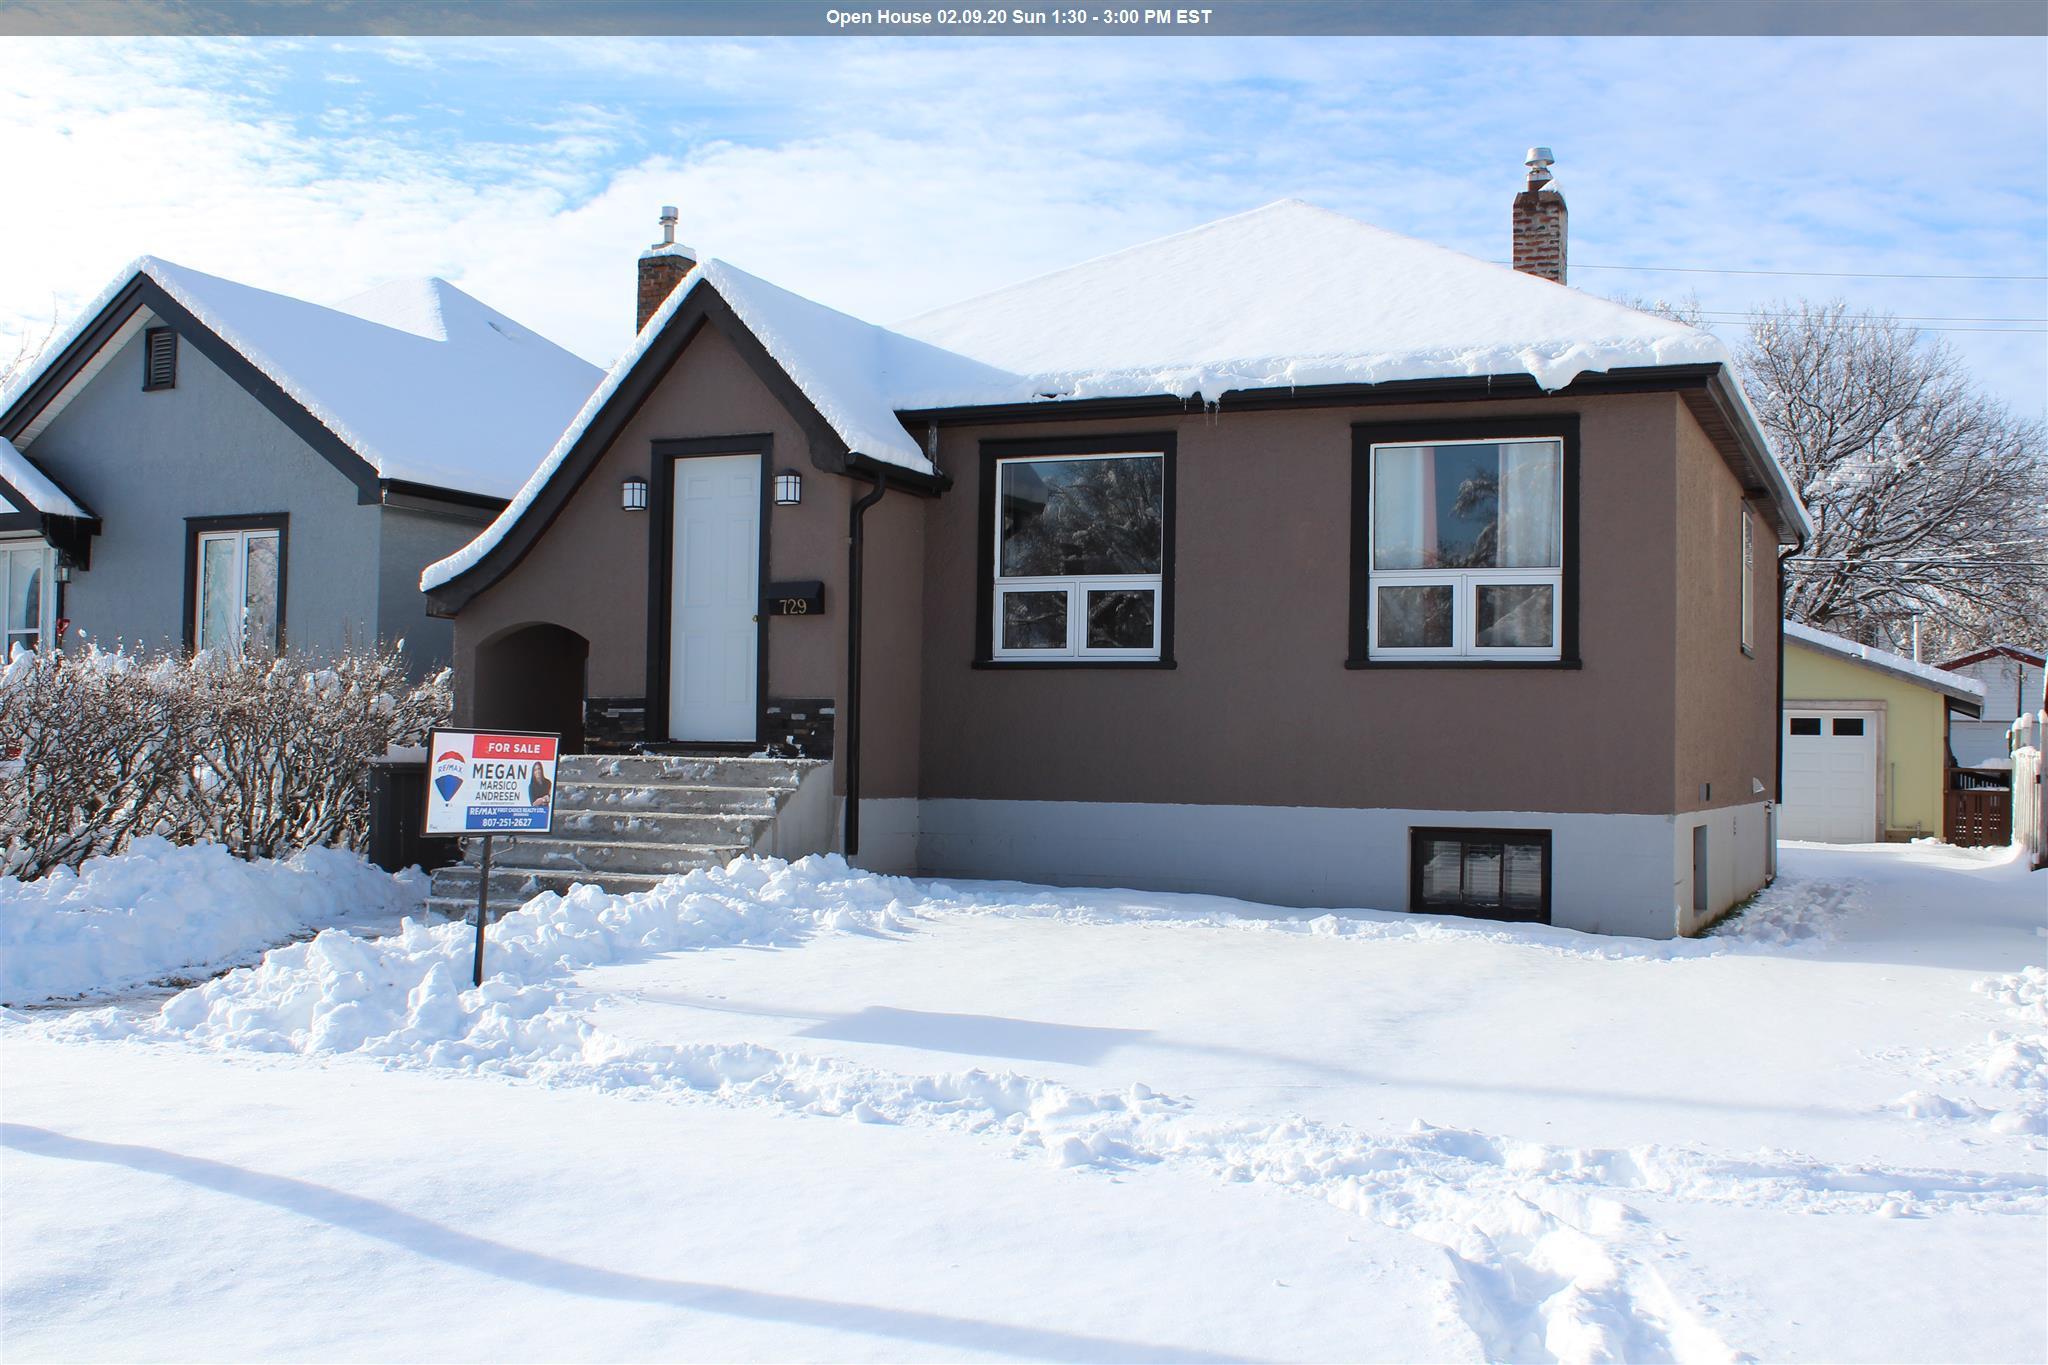 729 Norah Street S, Thunder Bay Ontario, Canada